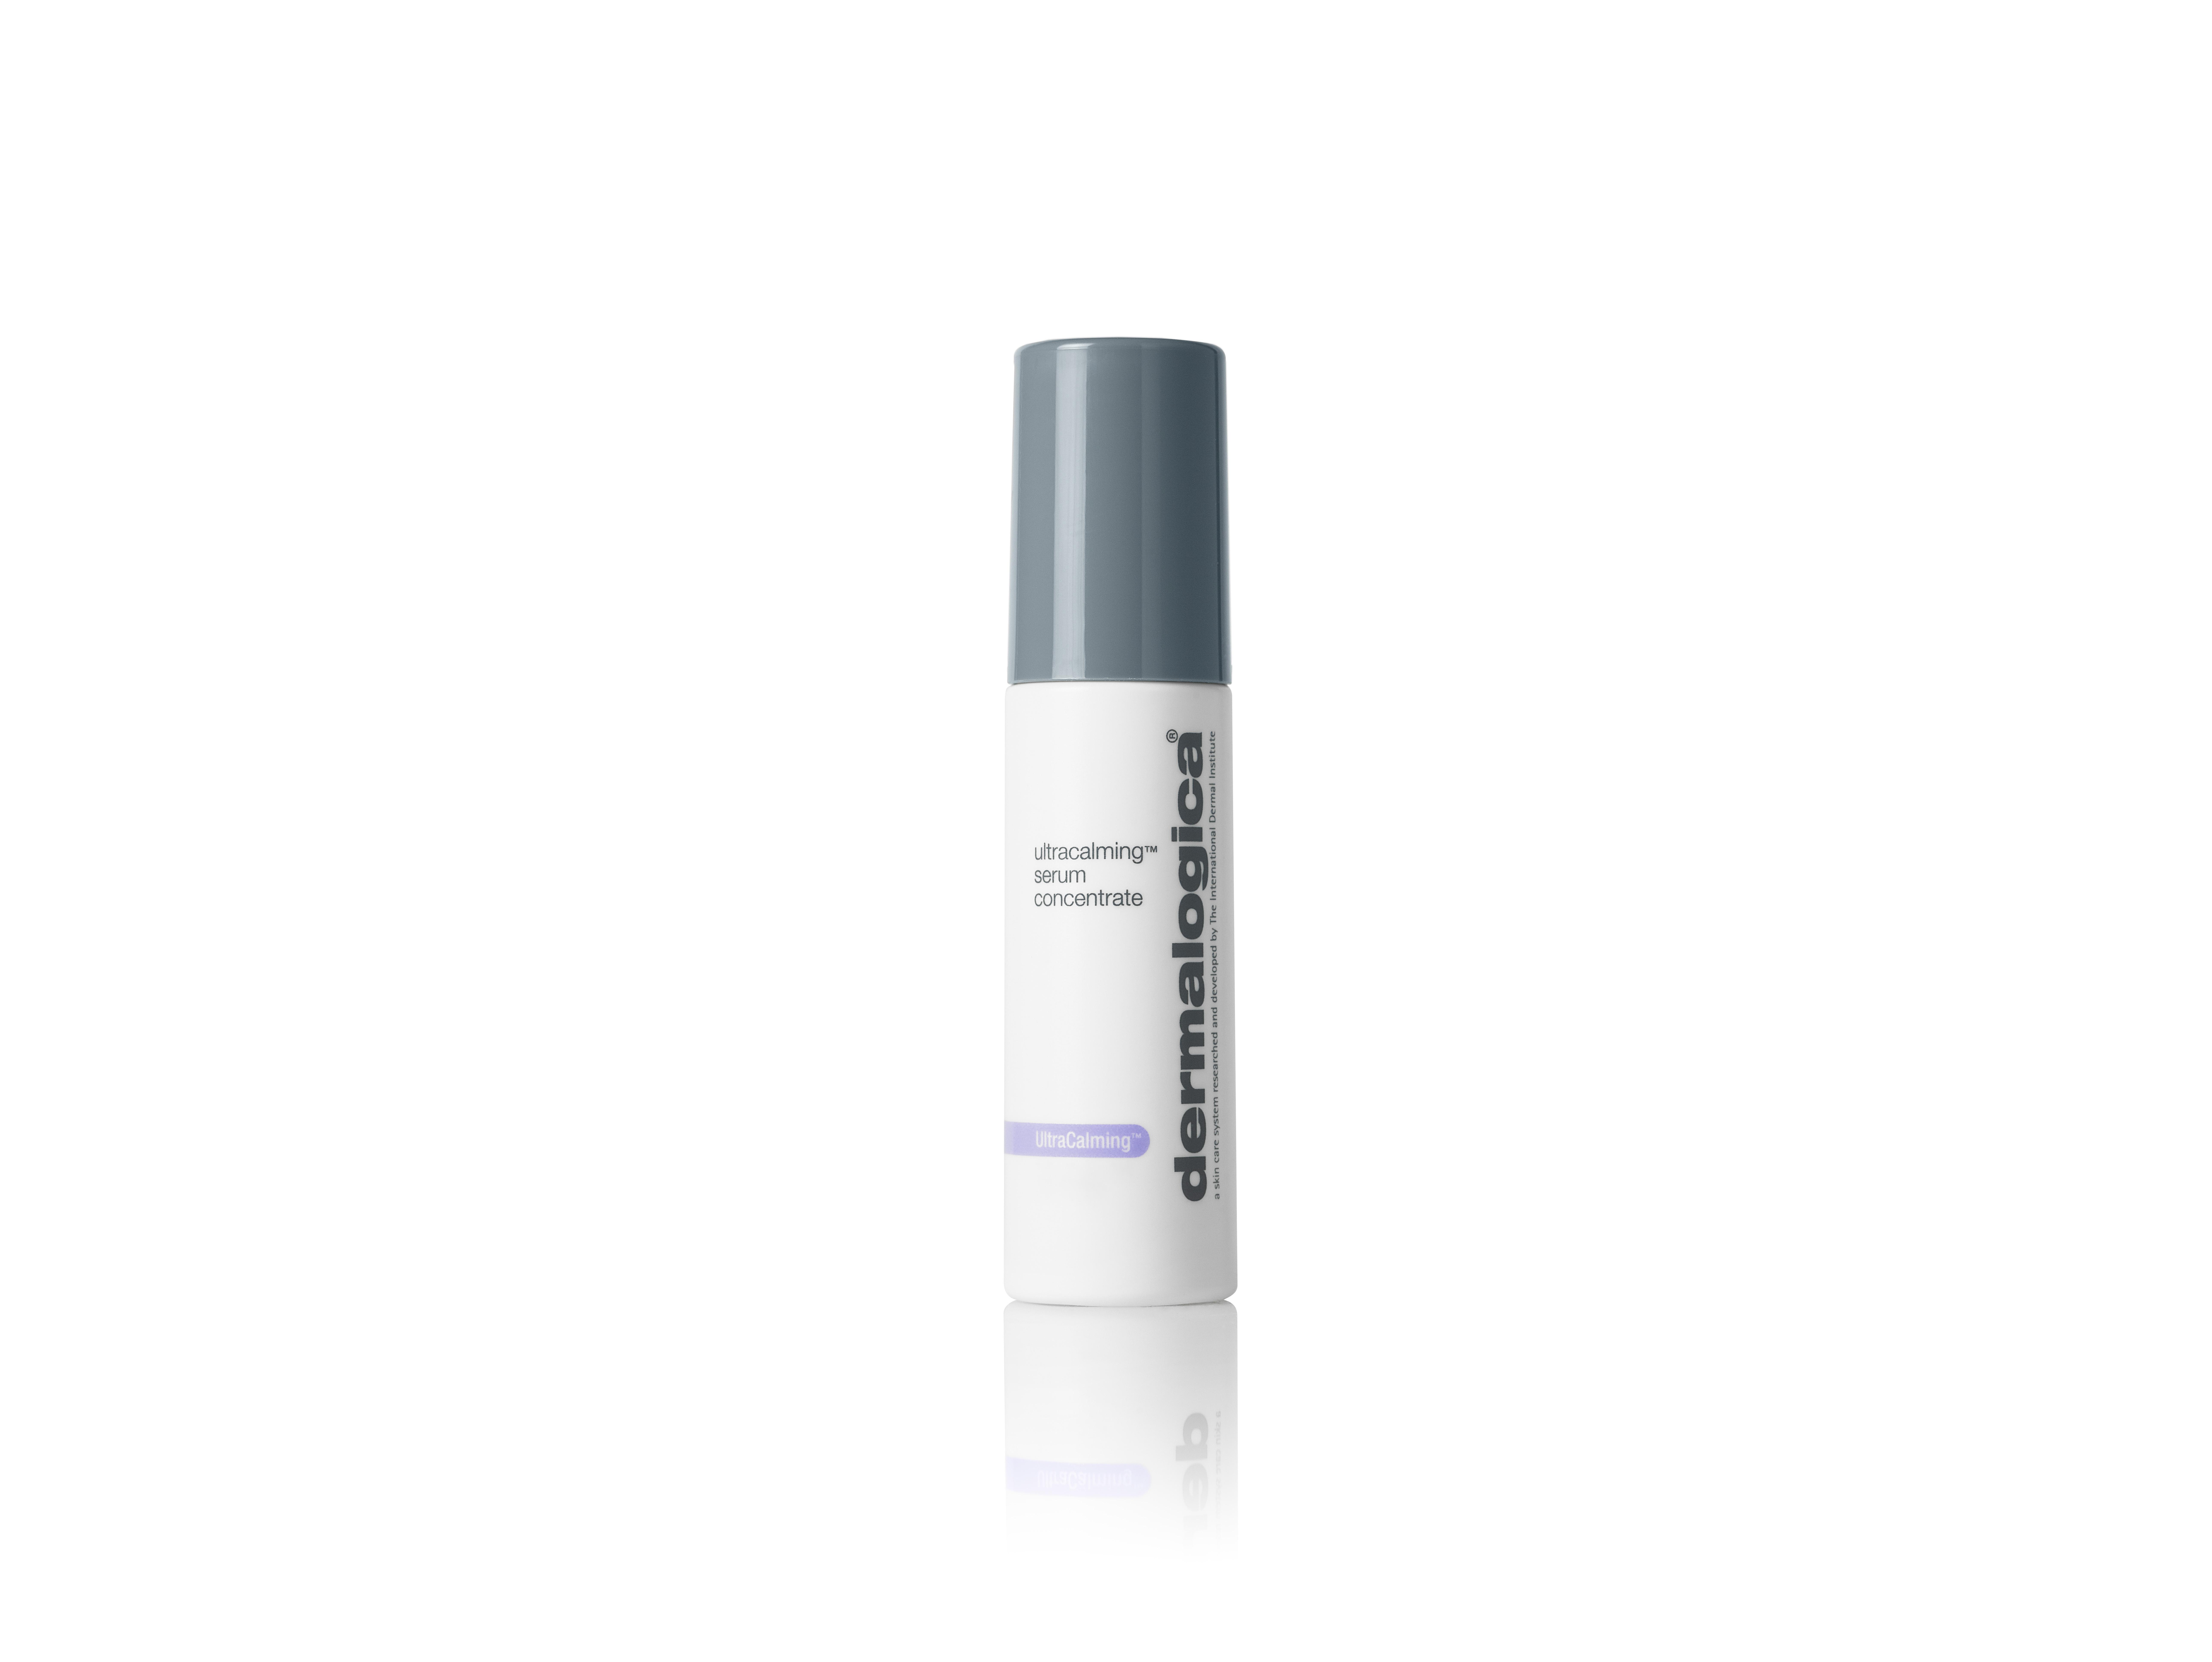 Dermalogica Ultracalming Serum Concentrate, 40 ml